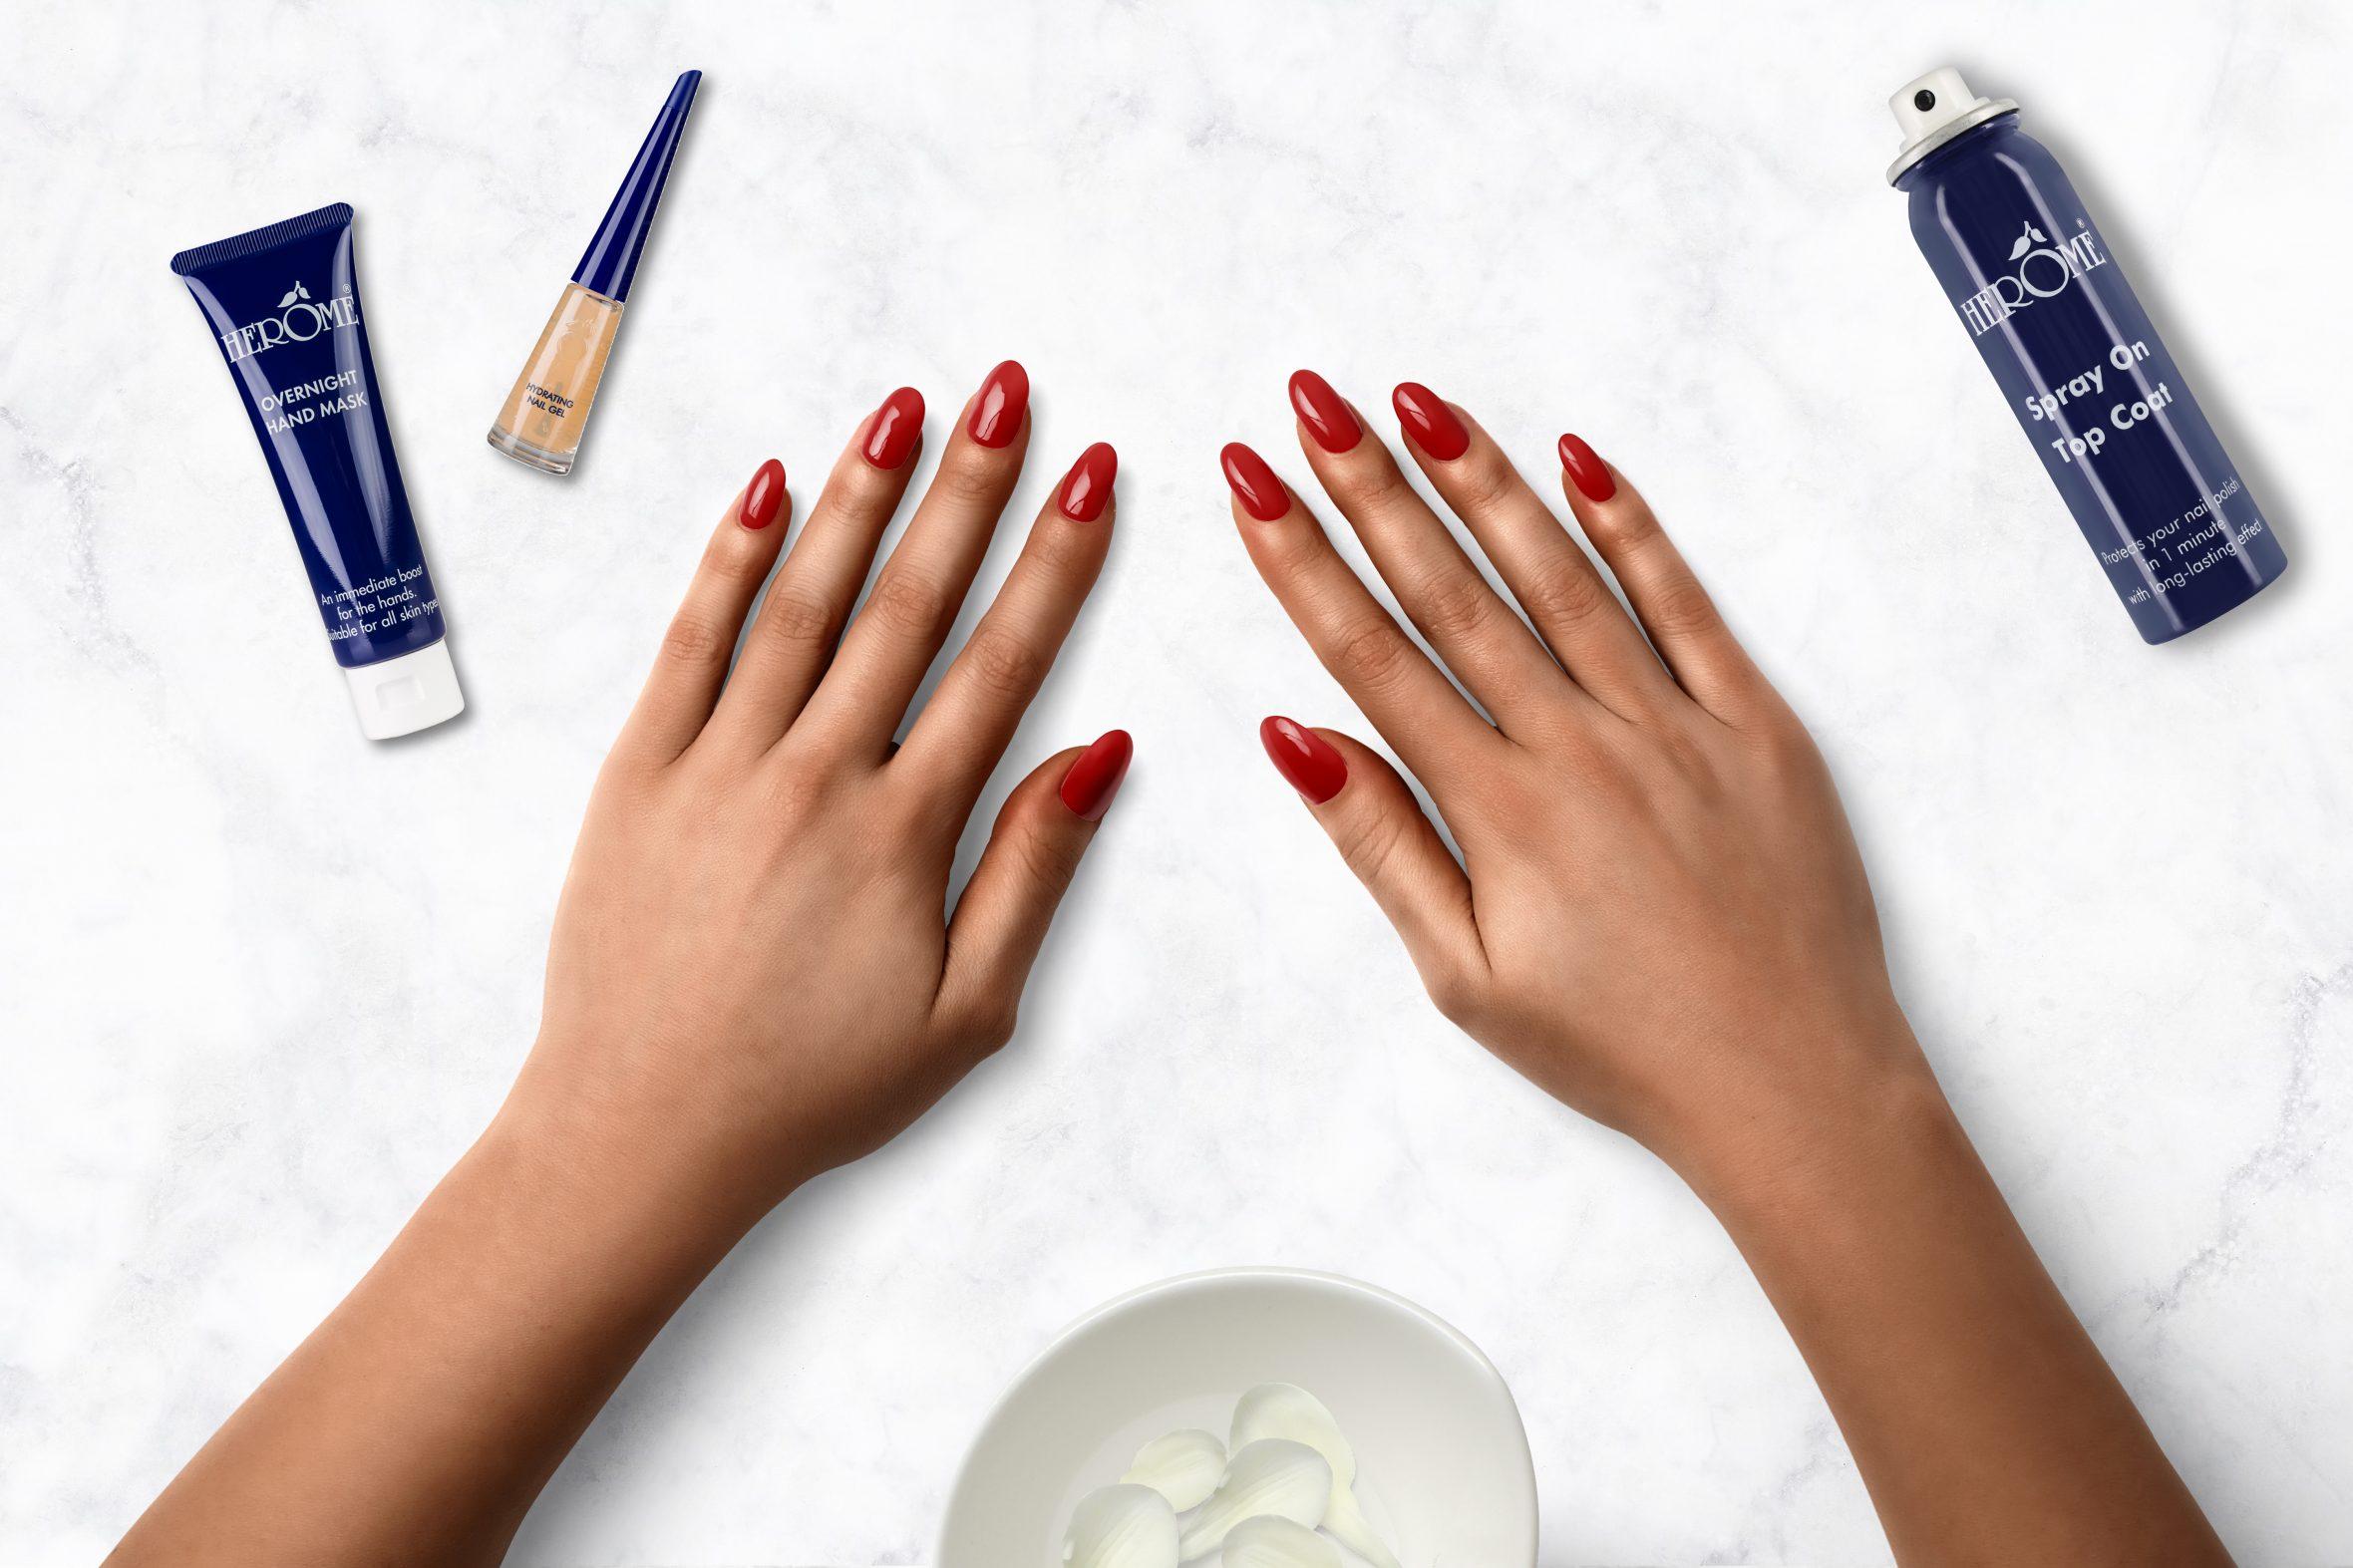 Donker rode nagellak voor je manicure